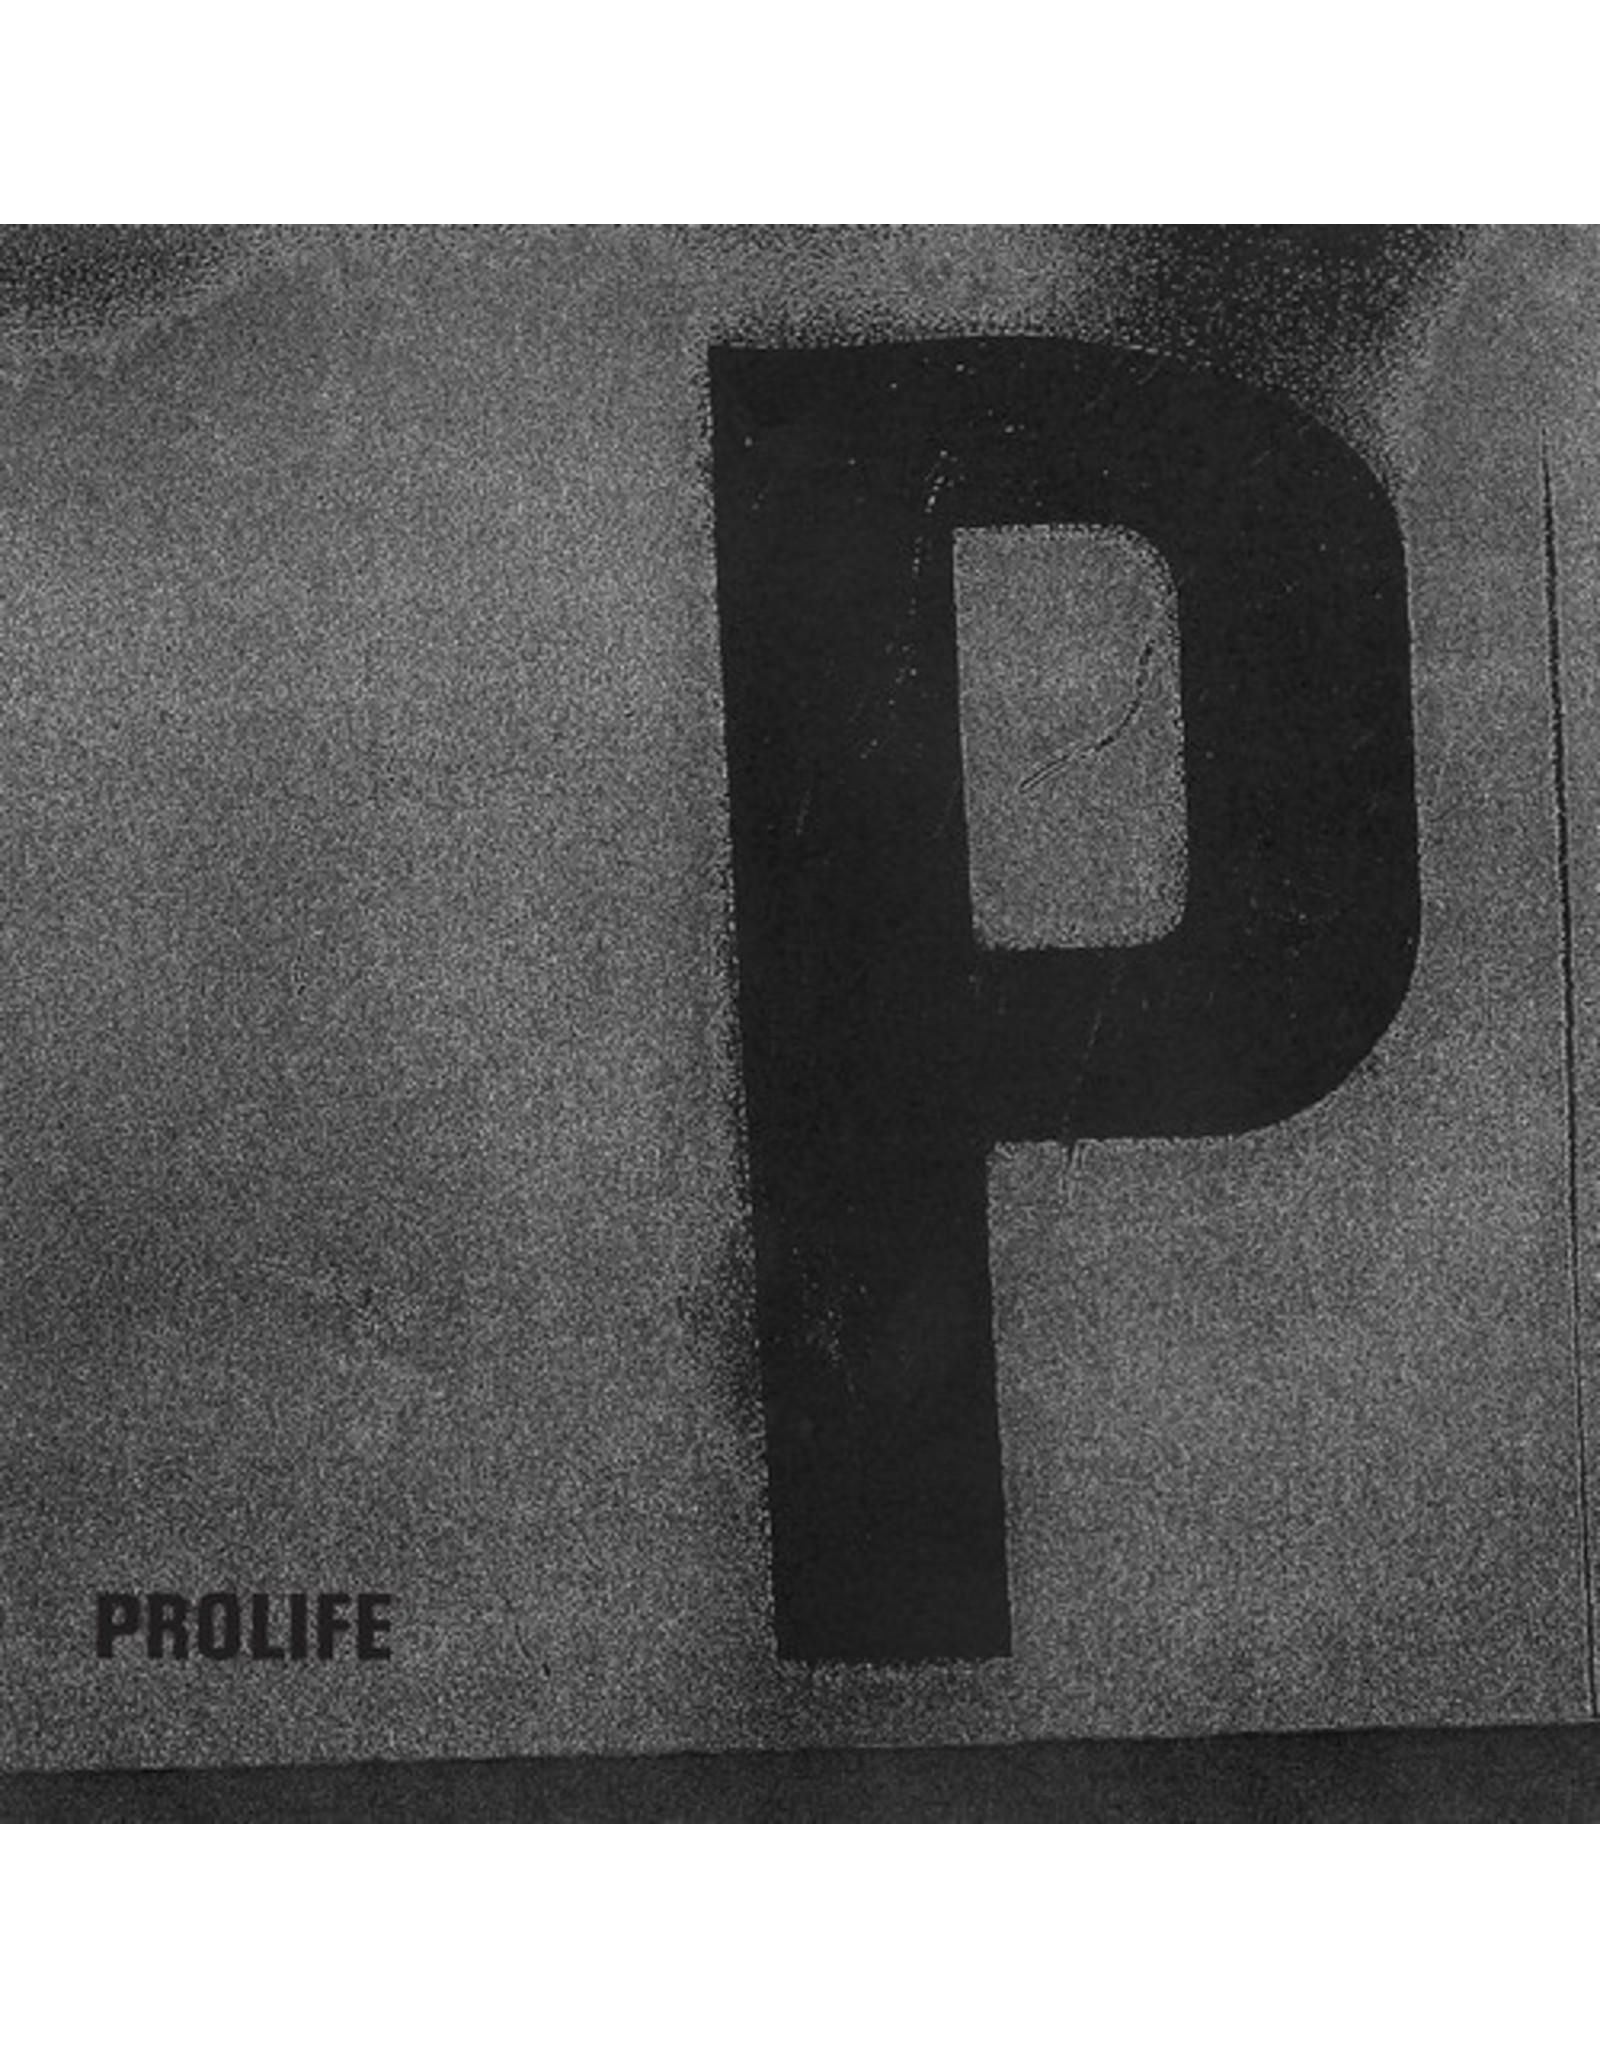 "New Vinyl Pro-Life - Overheated 7"""